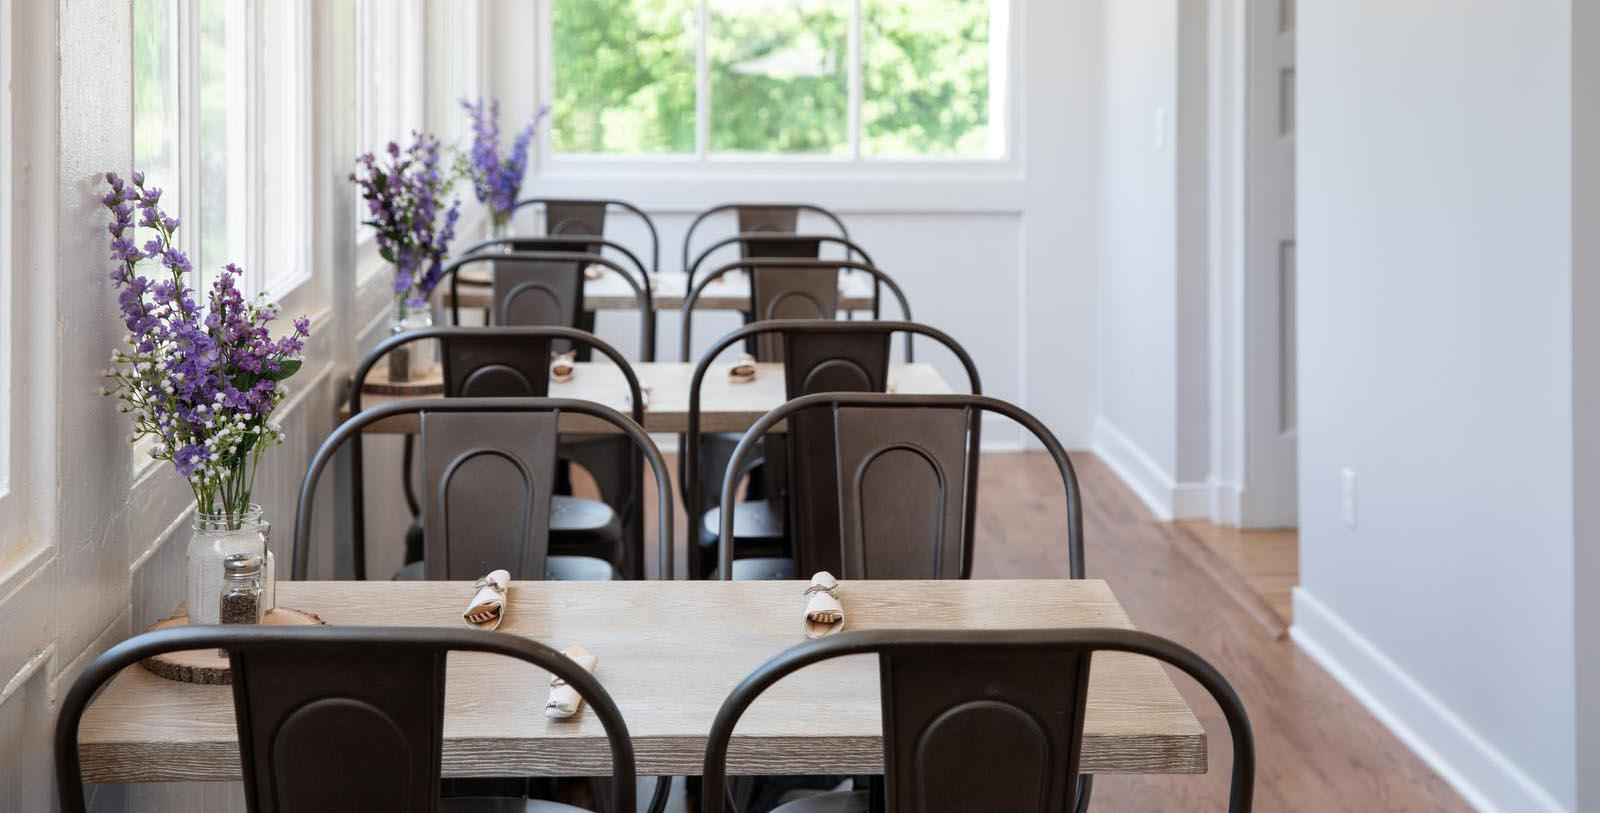 Image of tables at Second Draft Bistro at Blackburn Inn, 1828, Member of Historic Hotels of America, in Staunton, Virginia, Taste